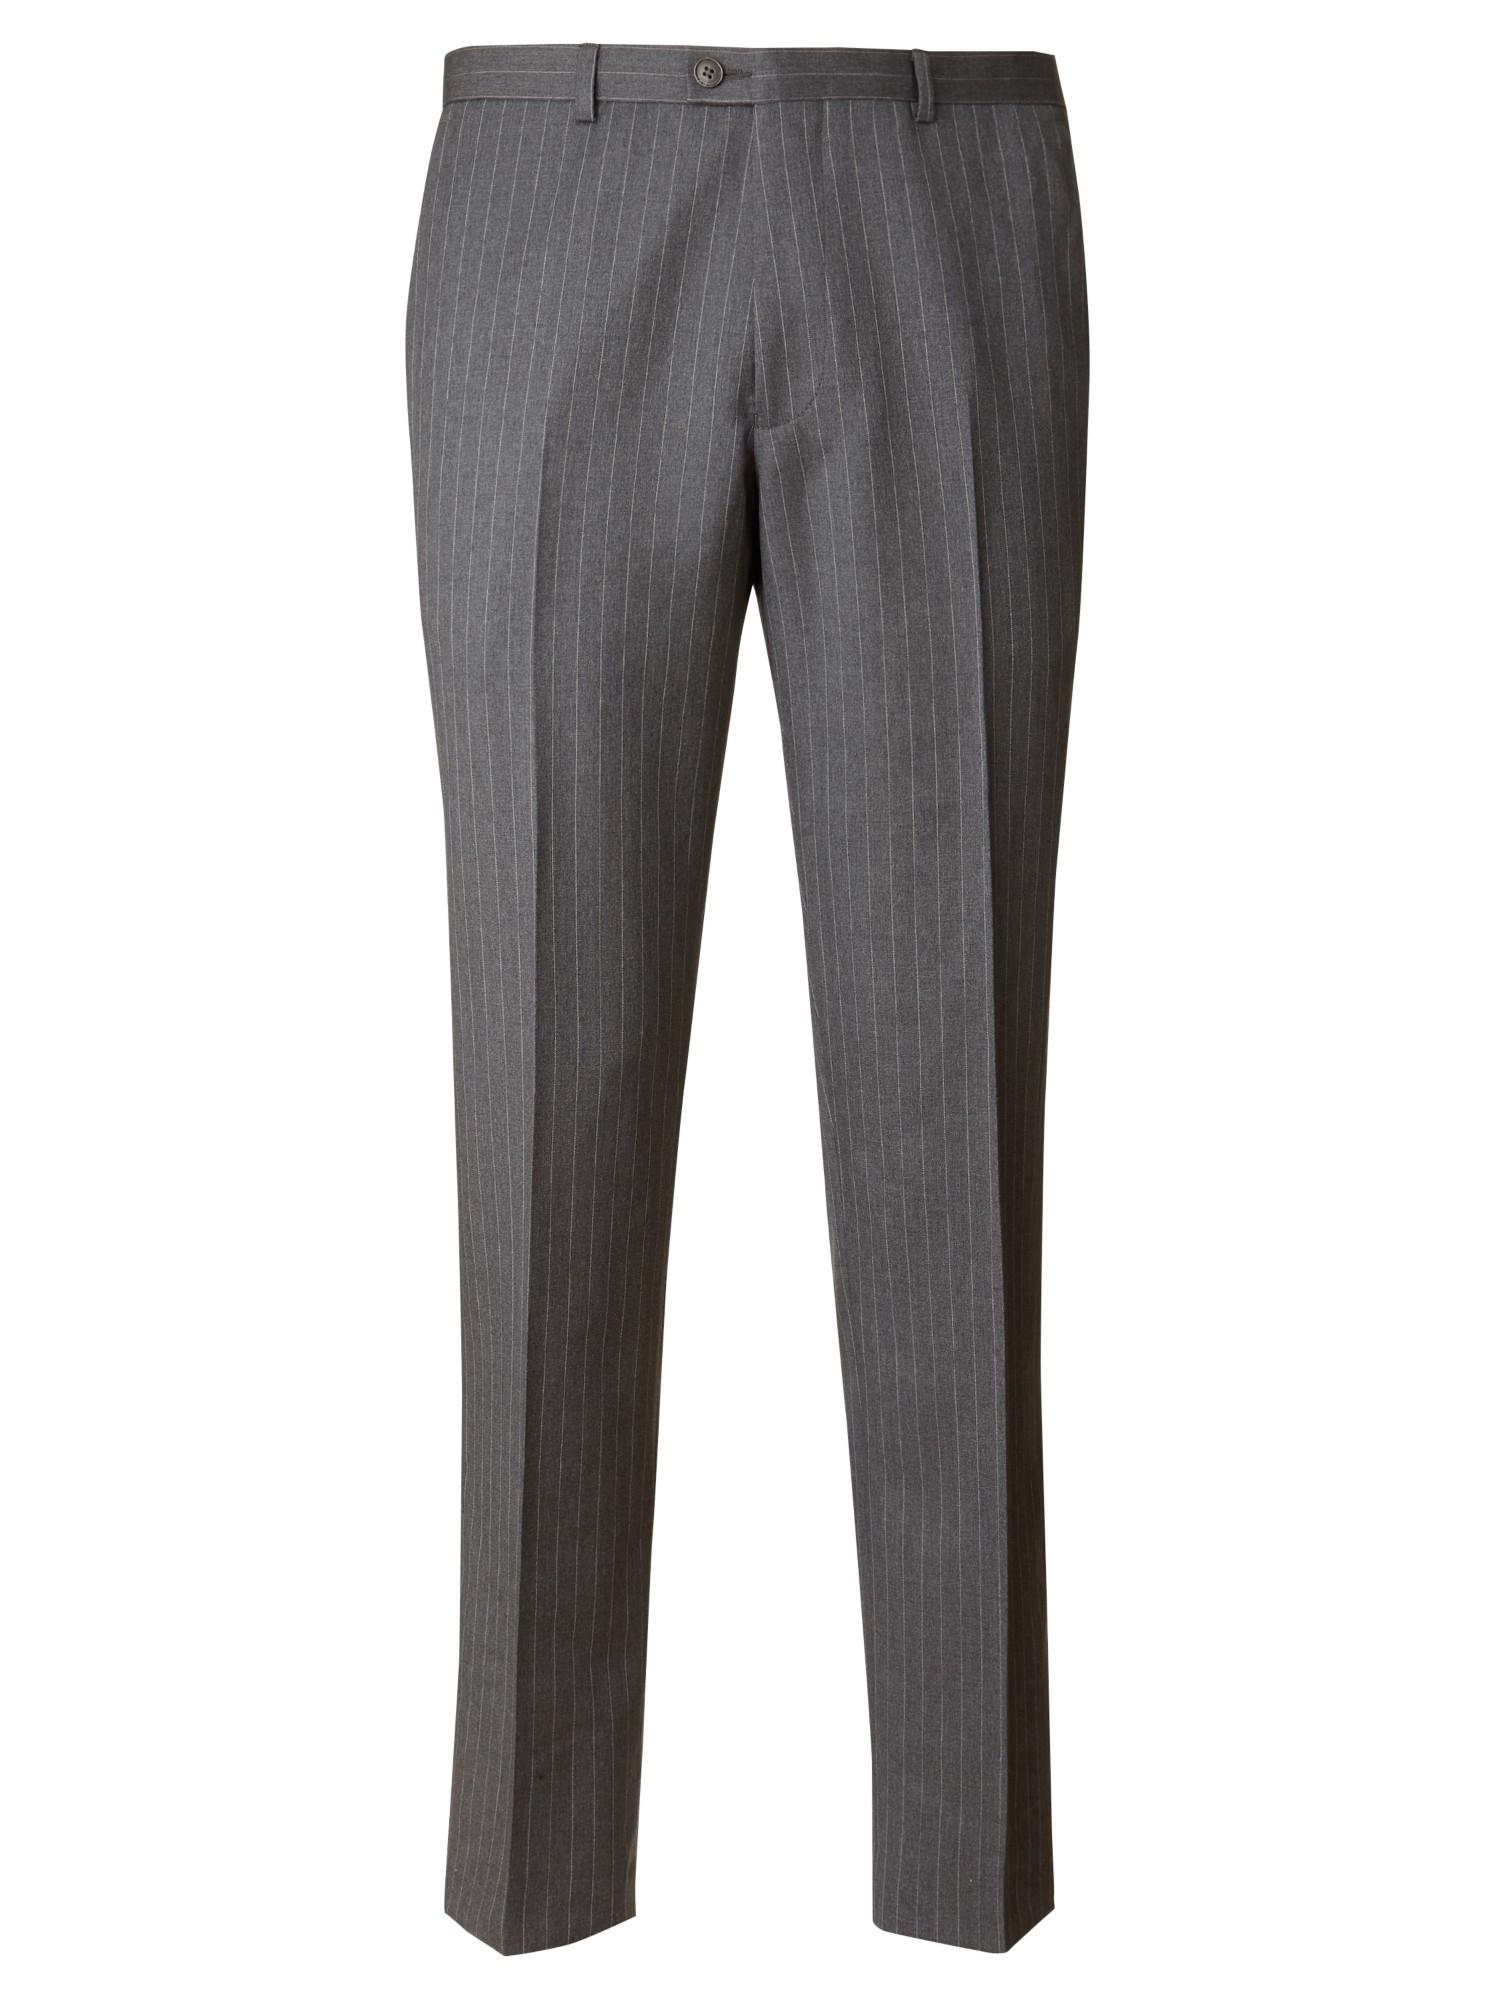 John Lewis Wool Tailored Italian Pinstripe Suit Trousers in Grey (Grey) for Men